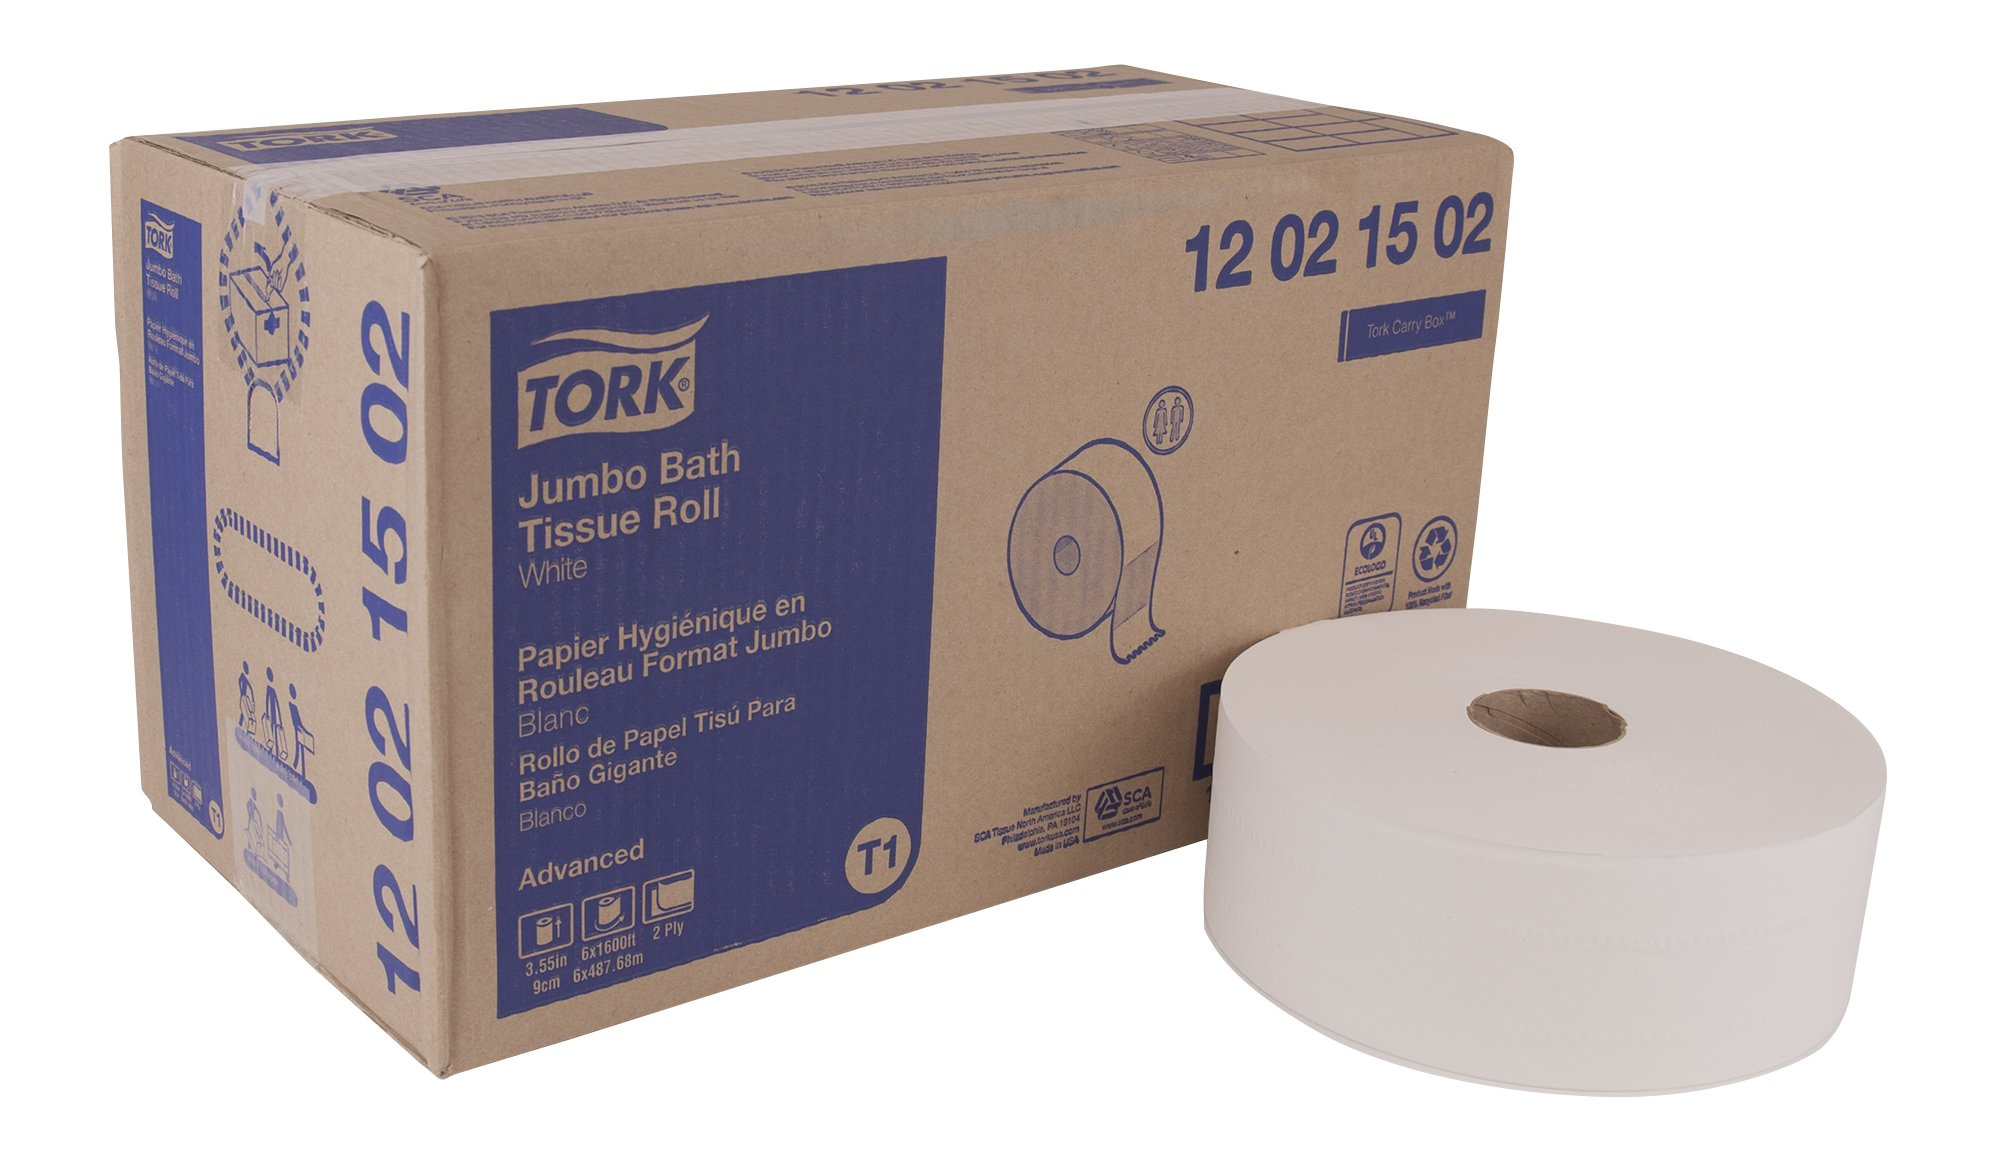 Tork Advanced 12021502 Jumbo Bath Tissue Roll, 2-Ply, 10'' Diameter, 3.55'' Width x 1,600' Length, White (Case of 6 Rolls, 1,600' per Roll, 9,600 Feet)